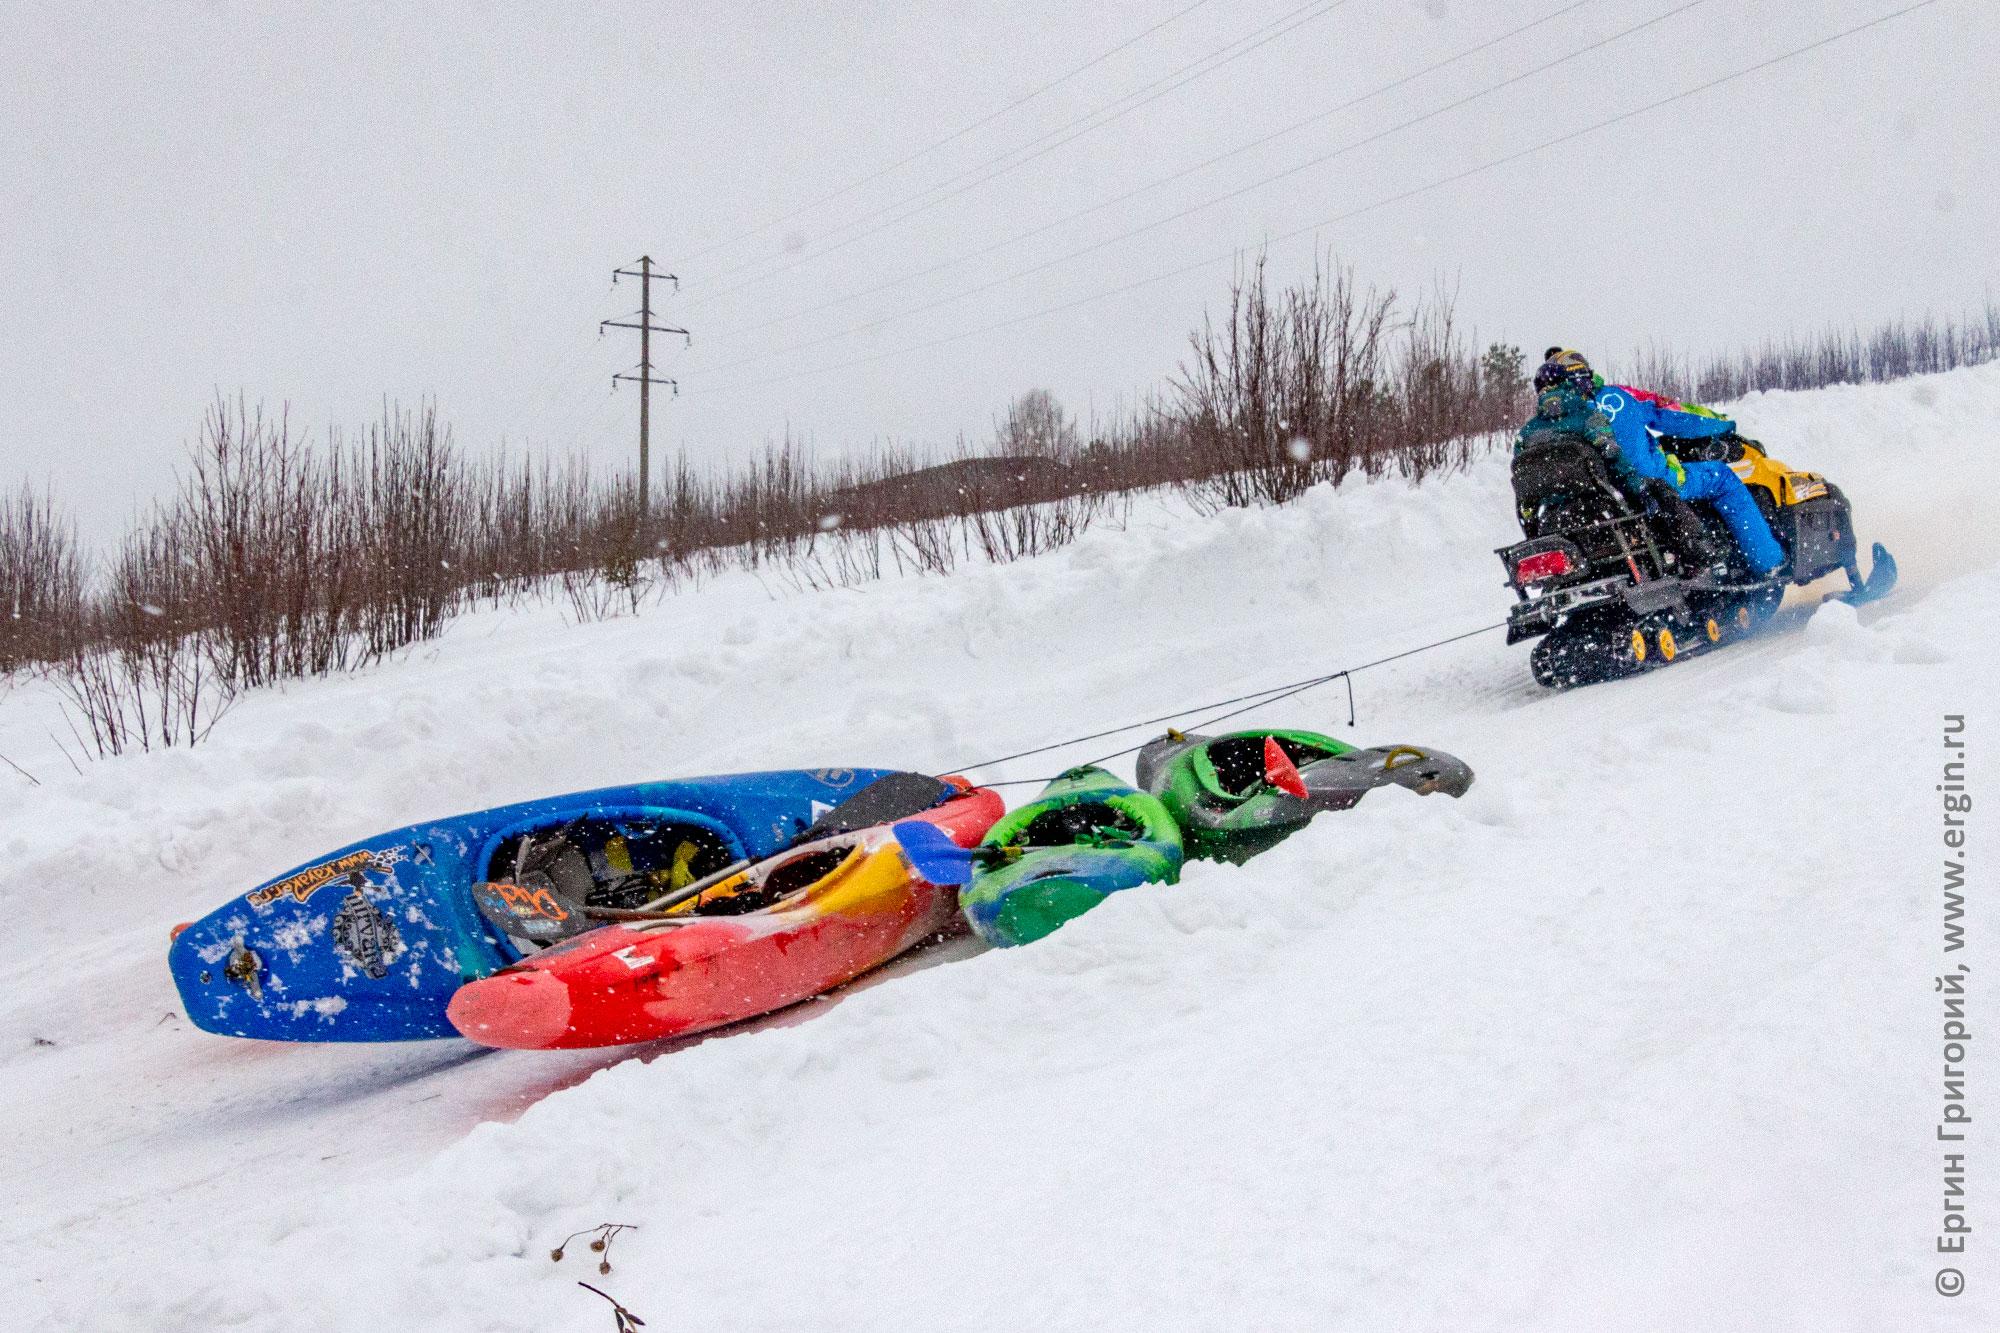 Подъем каяков на гору на снегоходе